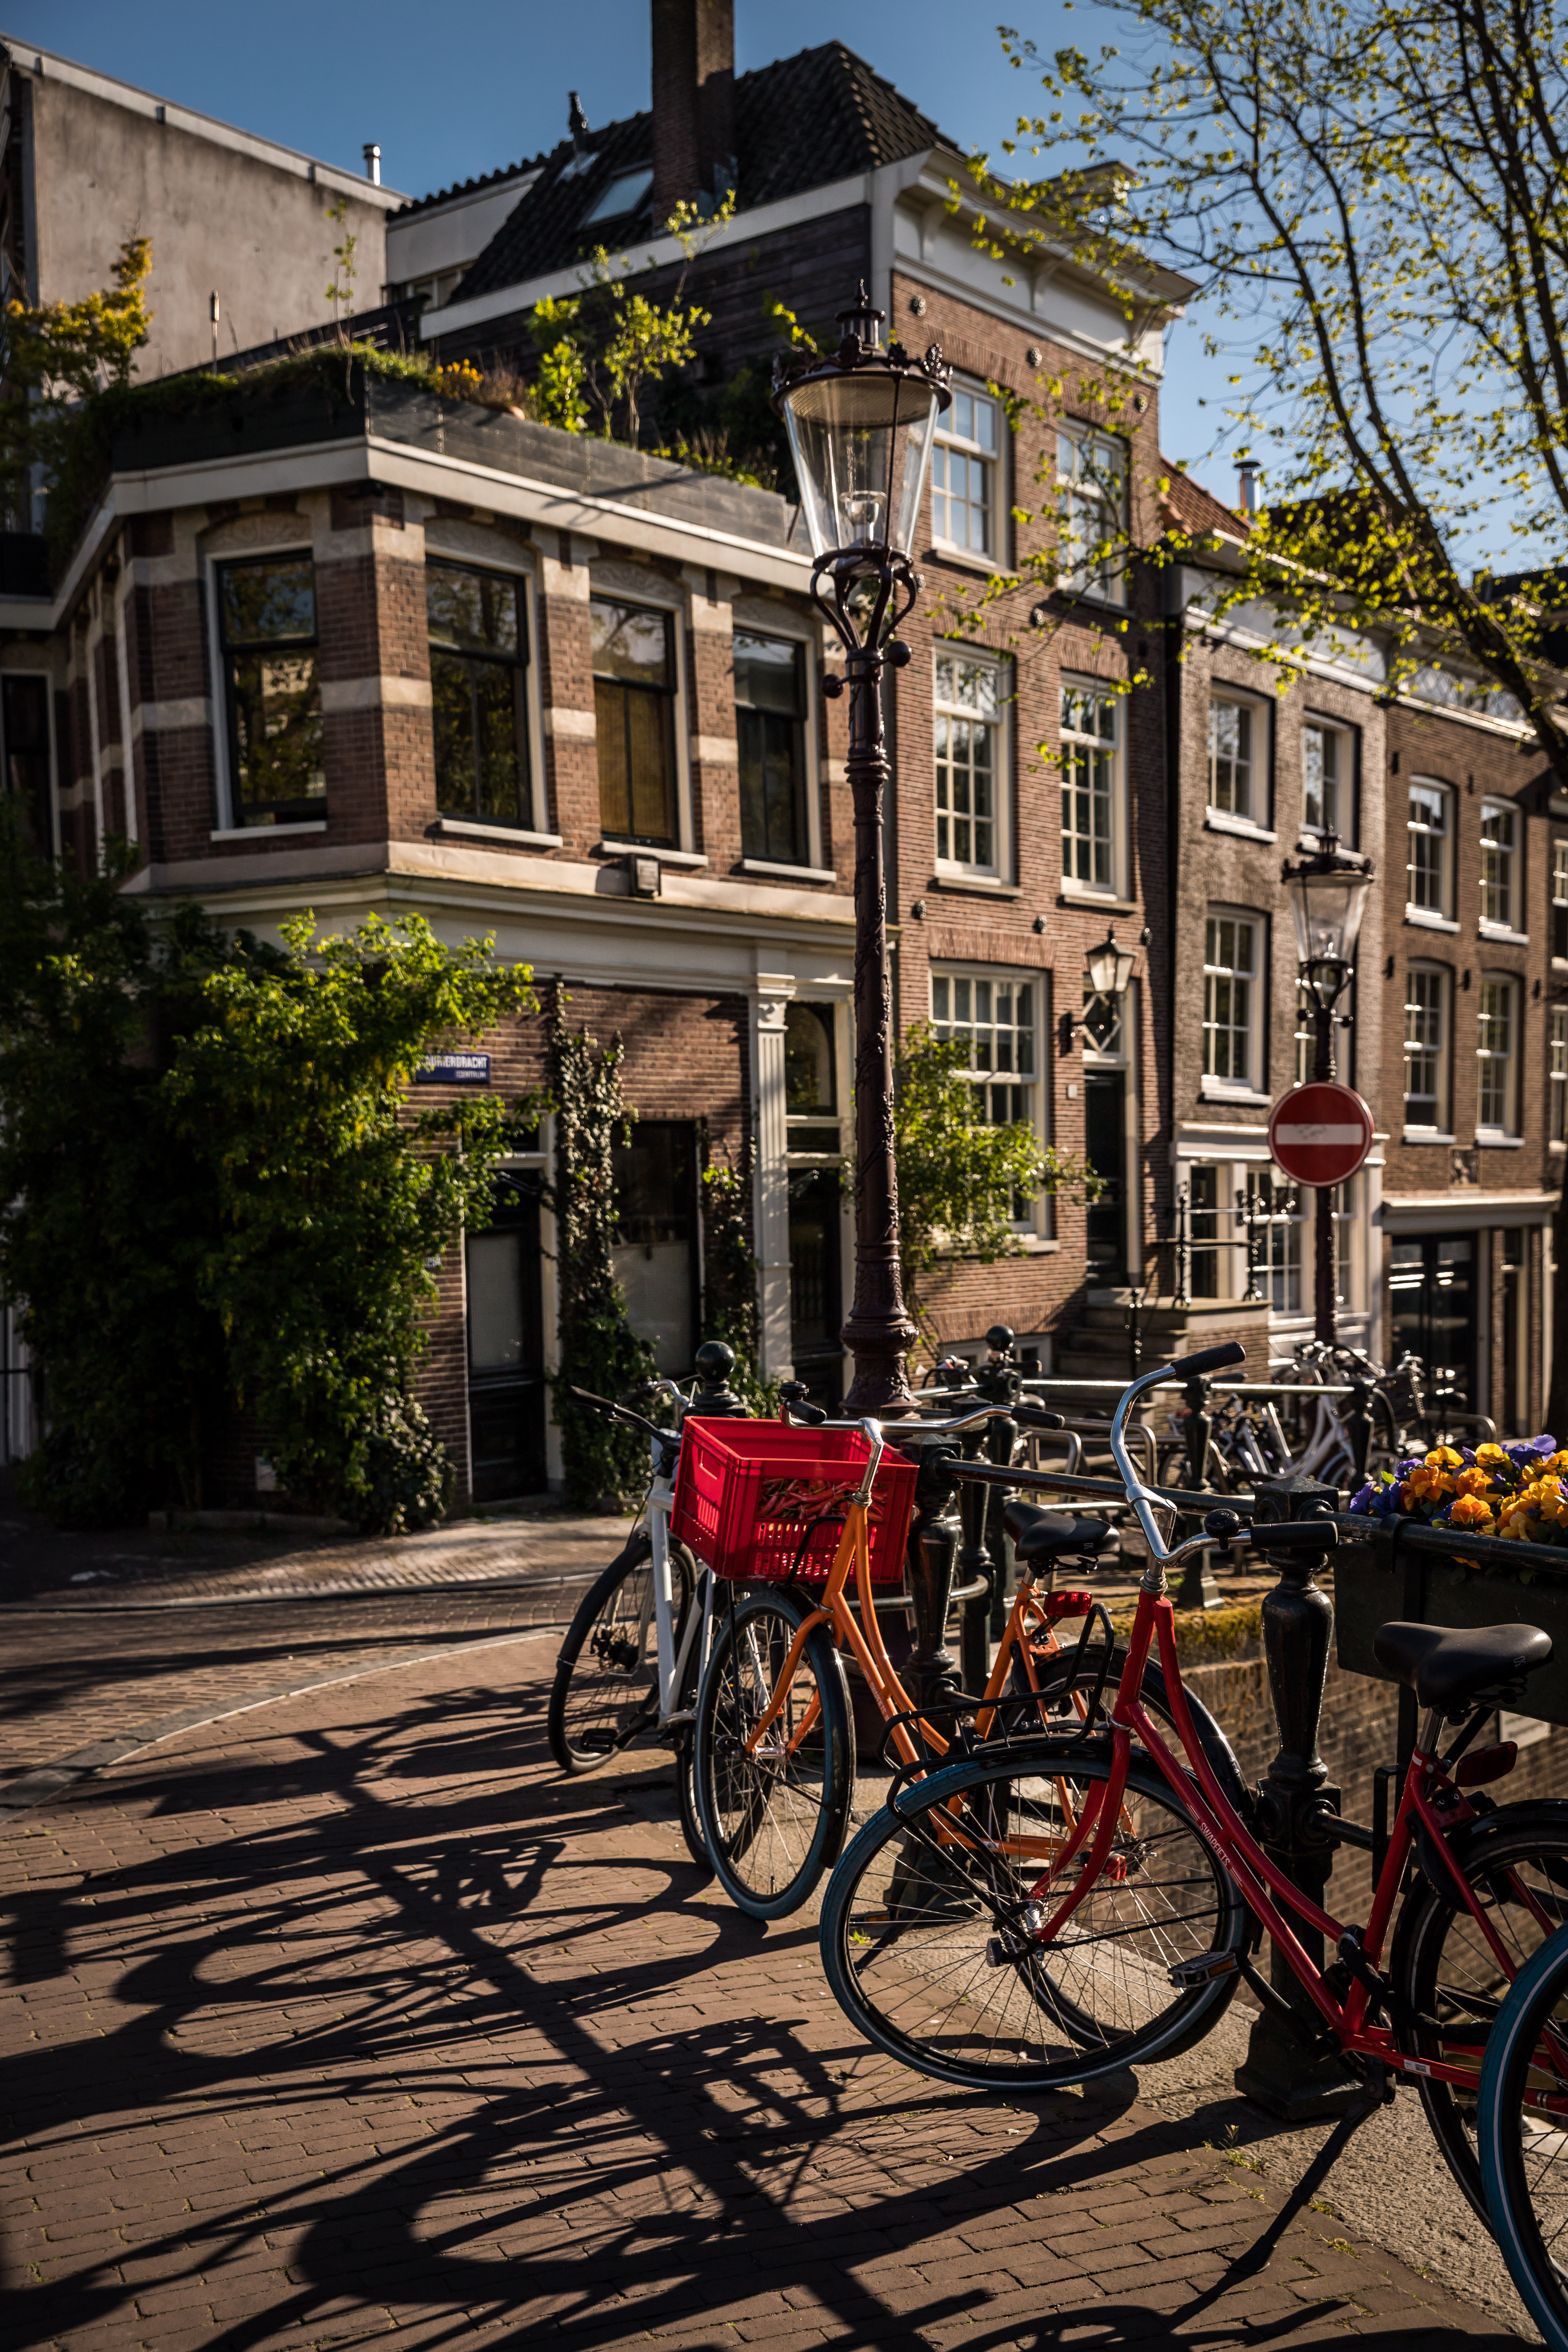 Zomers en Muisstil Amsterdam (Ashkan Mortezapour Photography) (4 of 6)